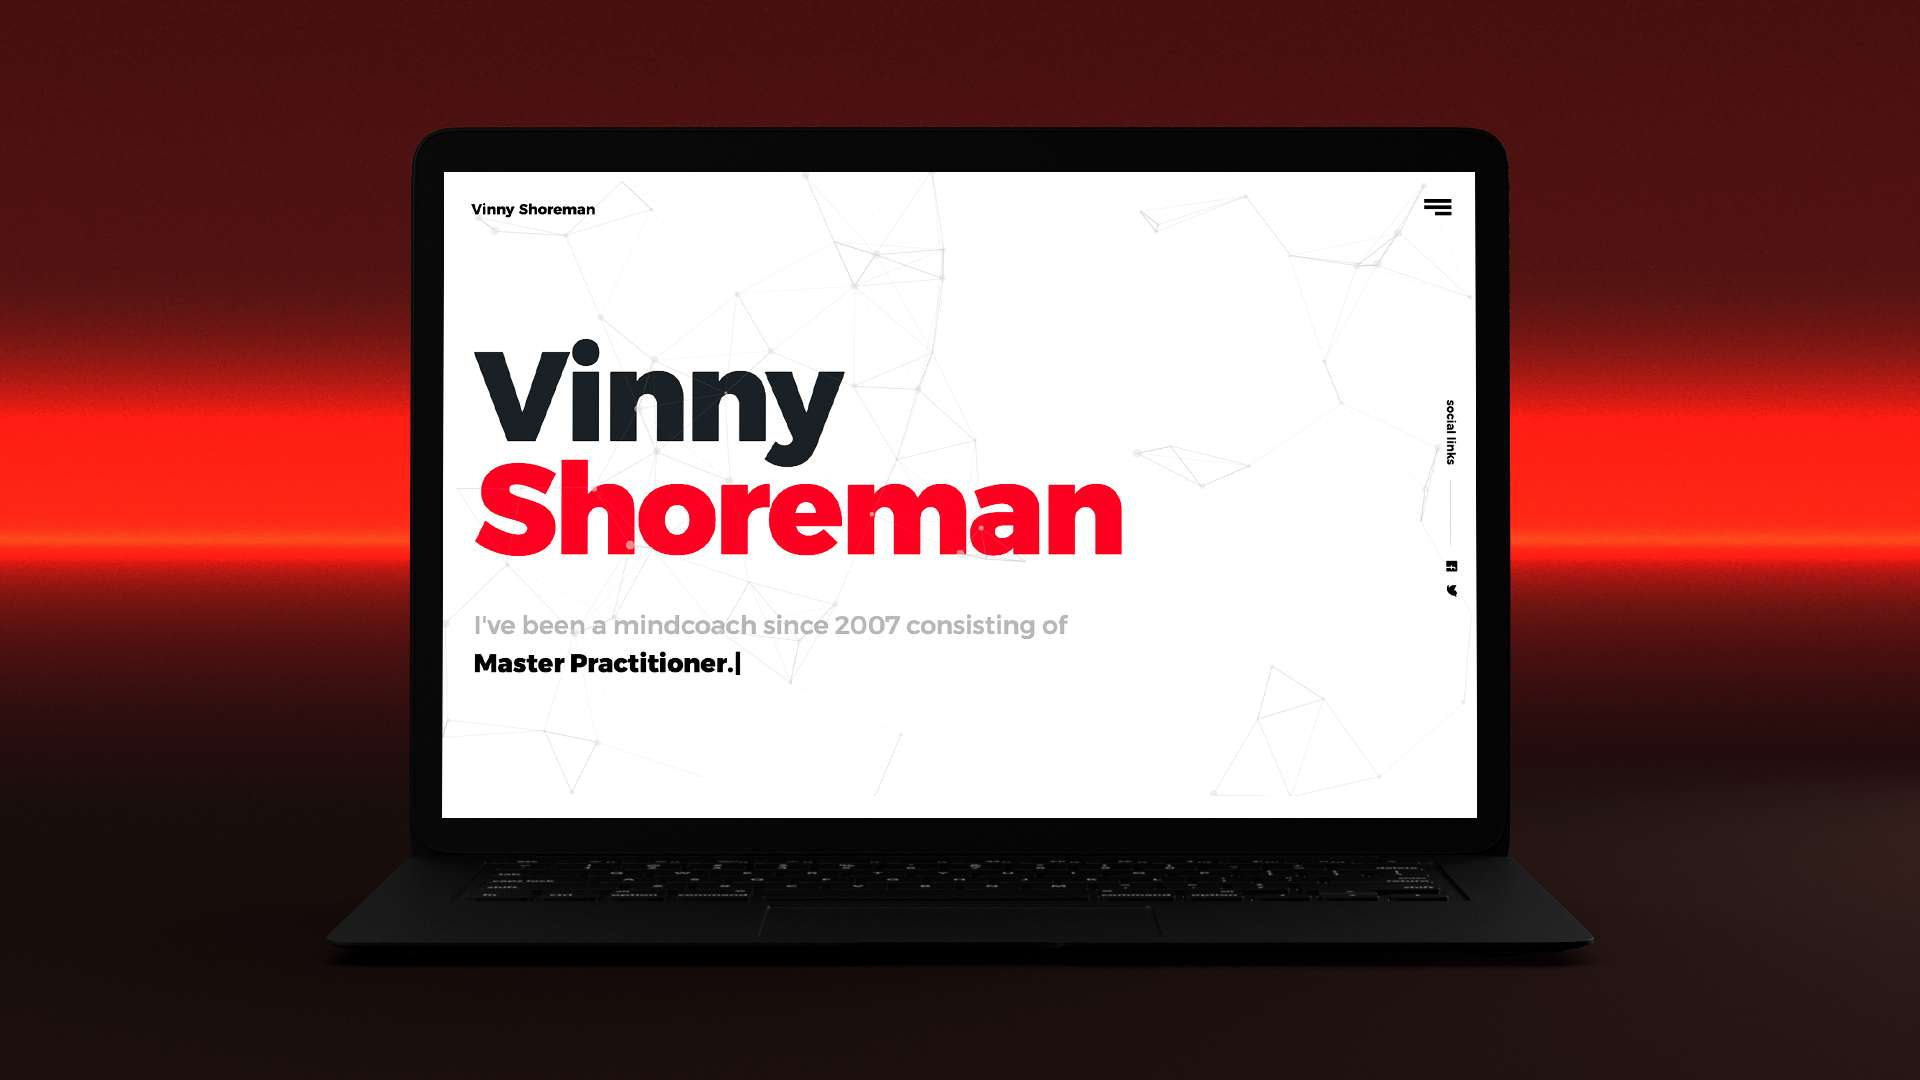 vinny shoreman website 1